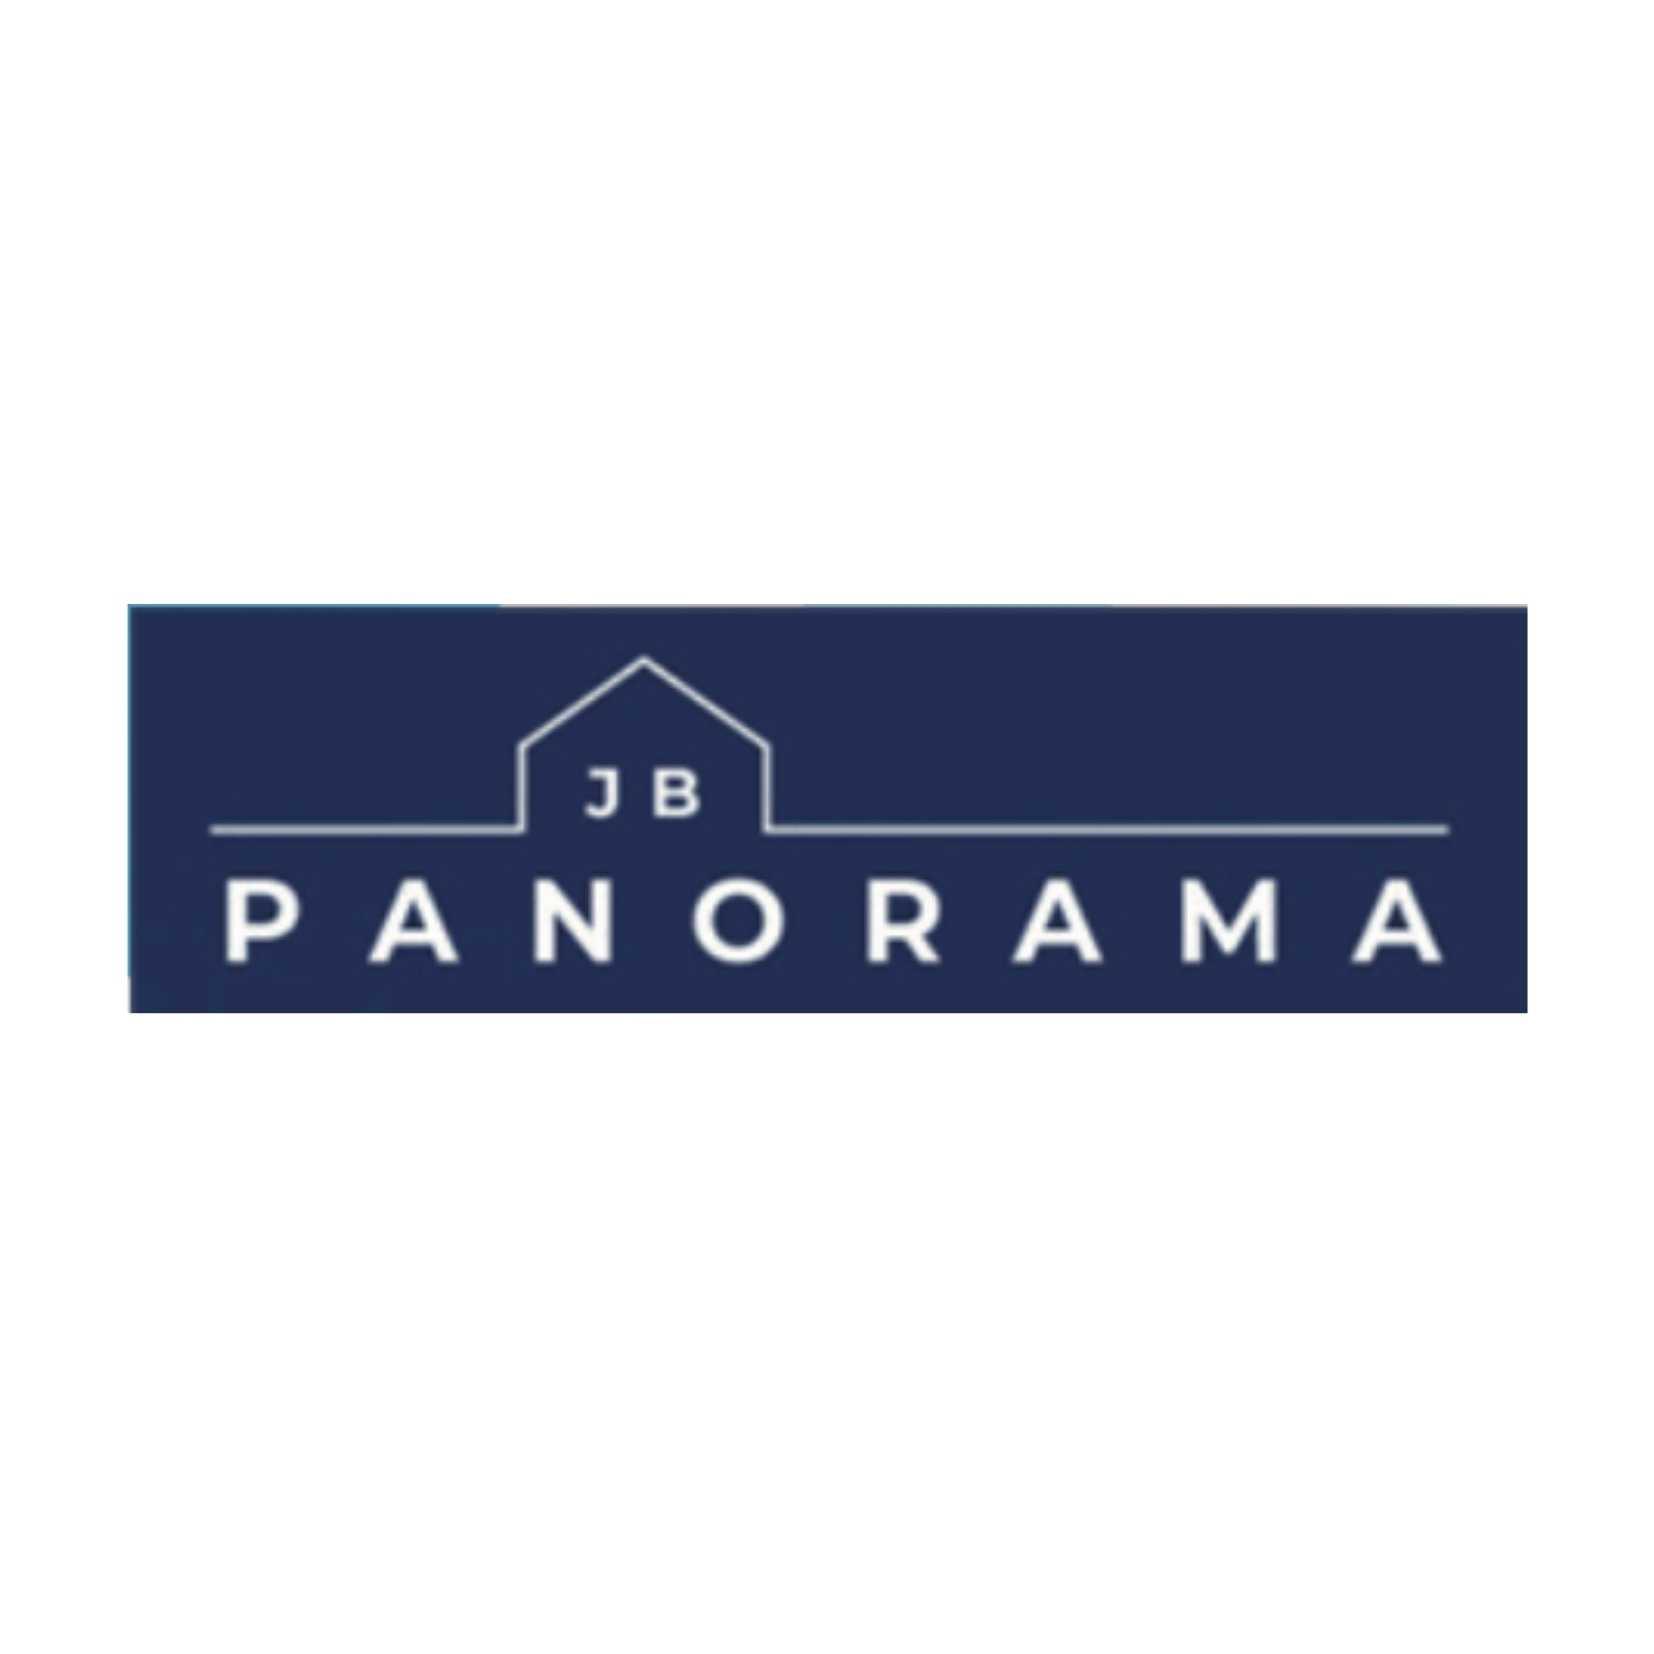 JB Insaat Panorama Logo - Listing Turkey